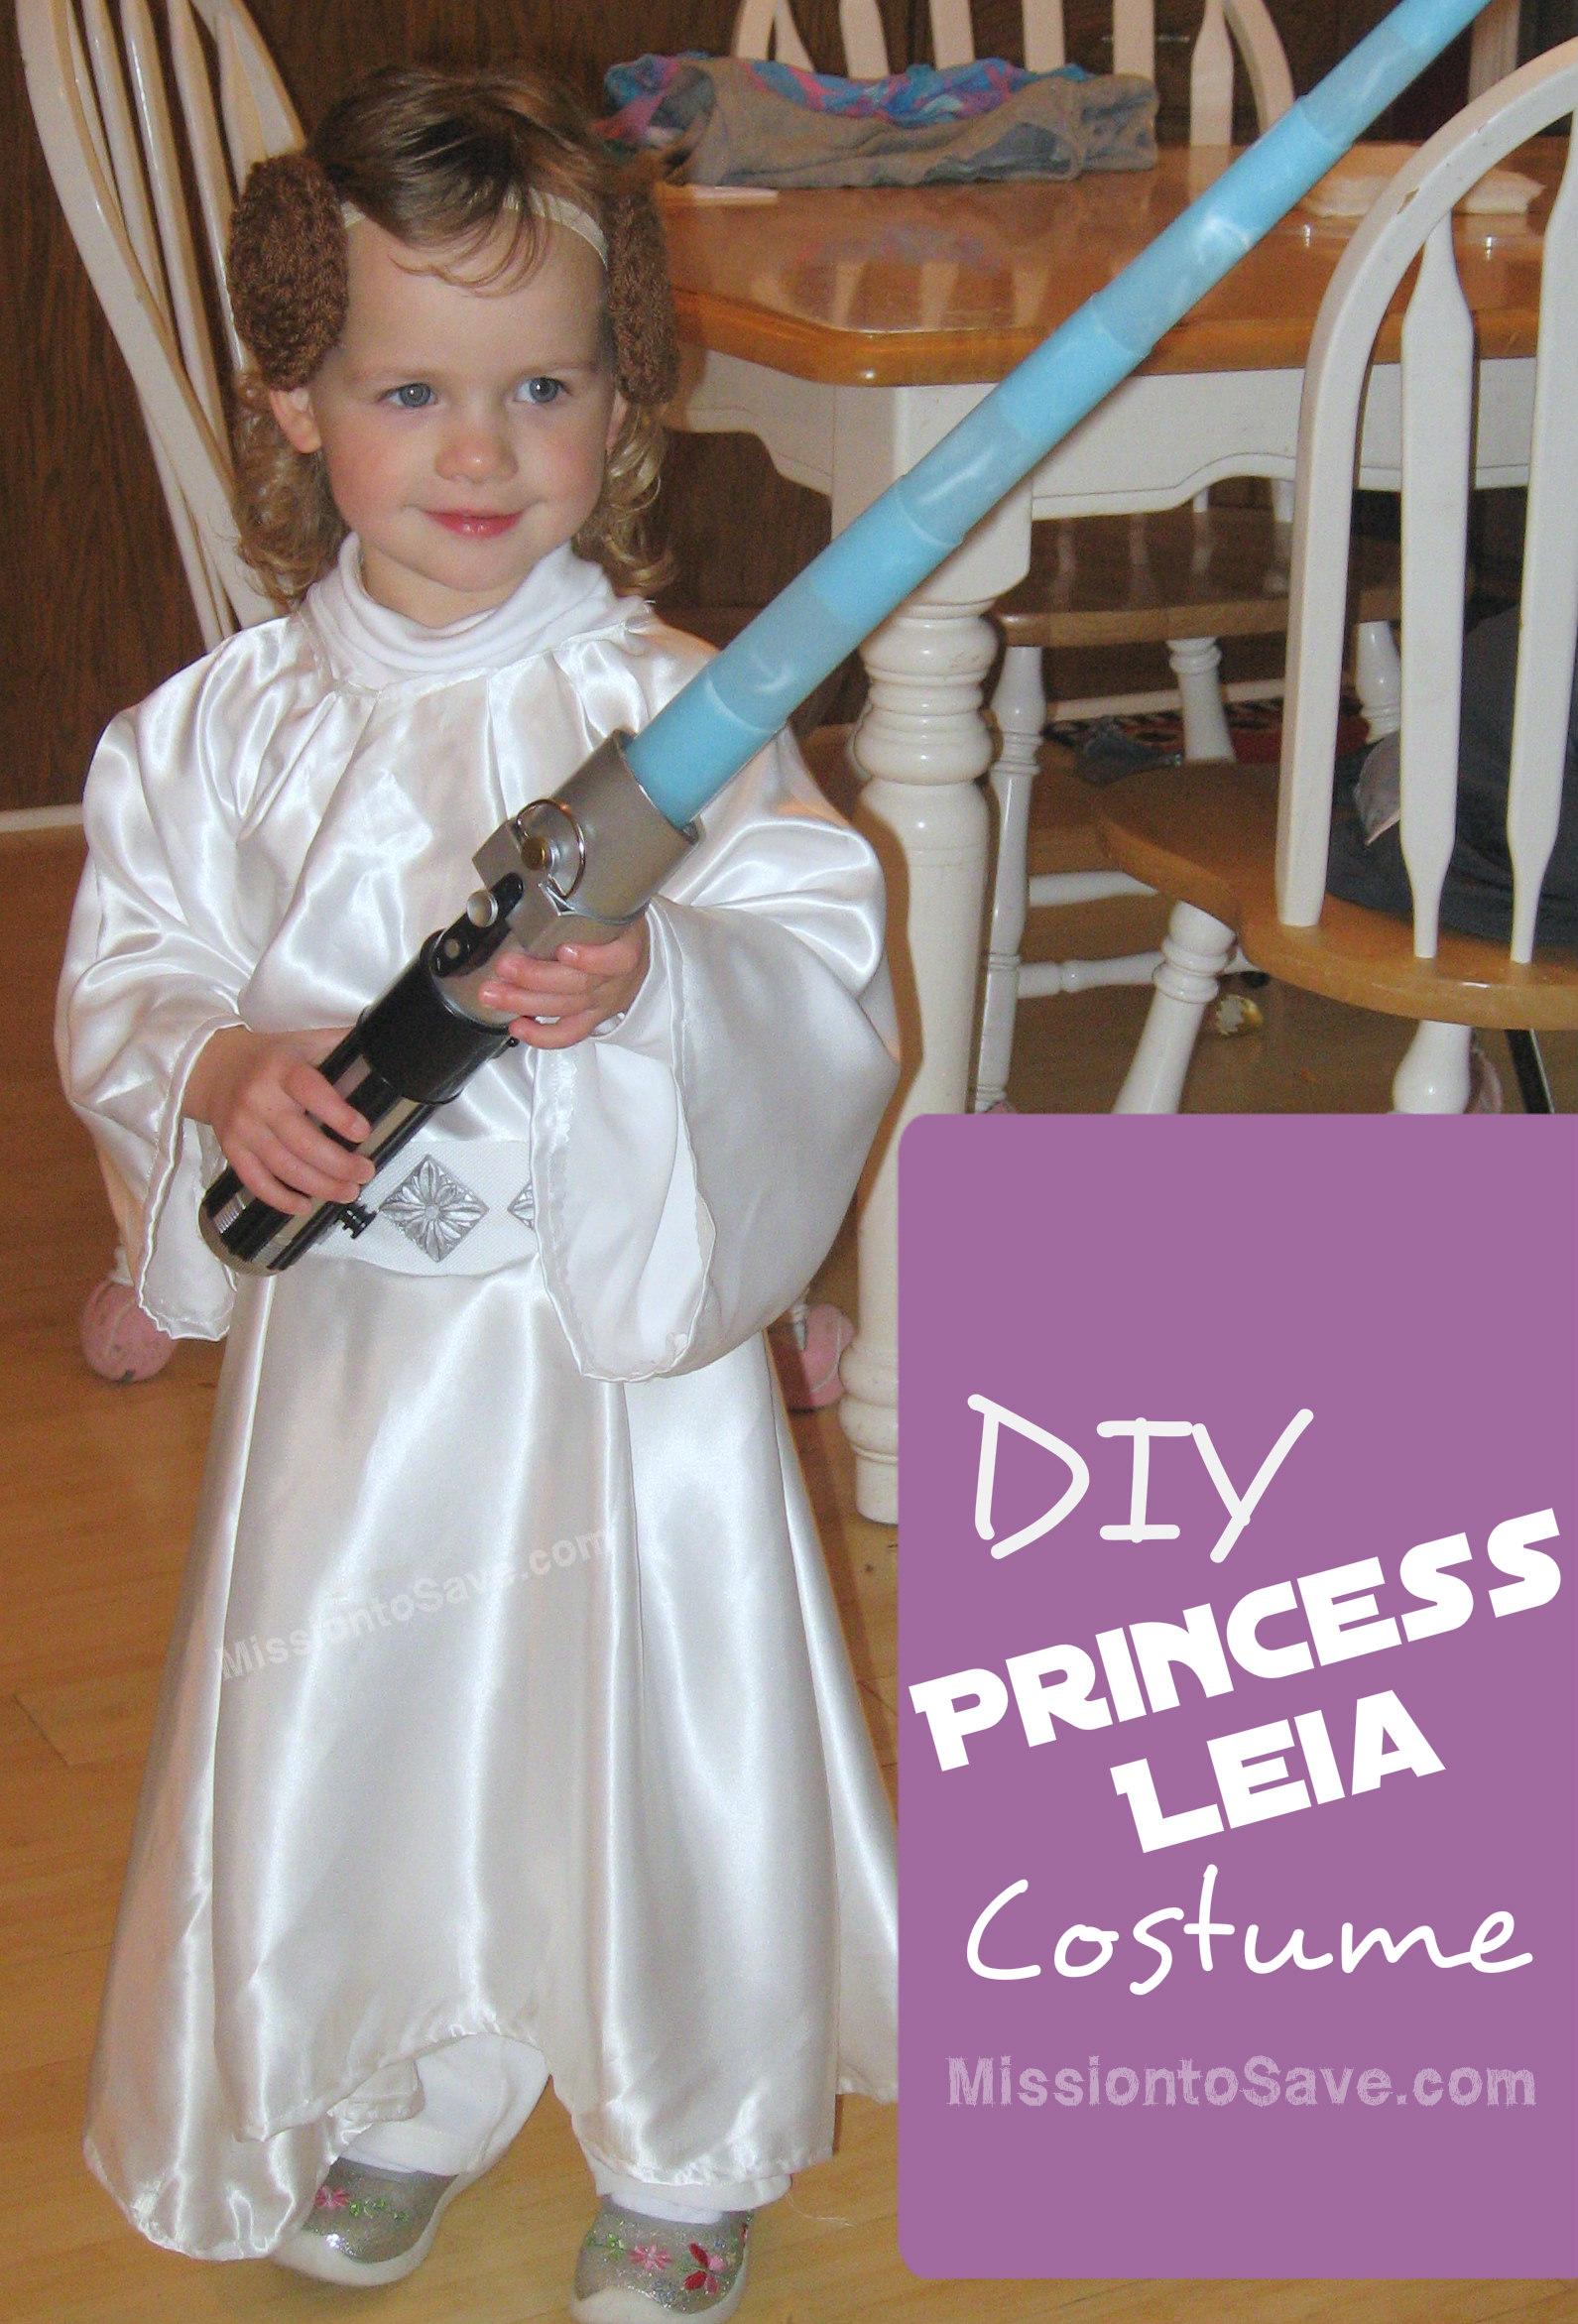 Diy Star Wars Costumes Jedi And Princess Leia Mission